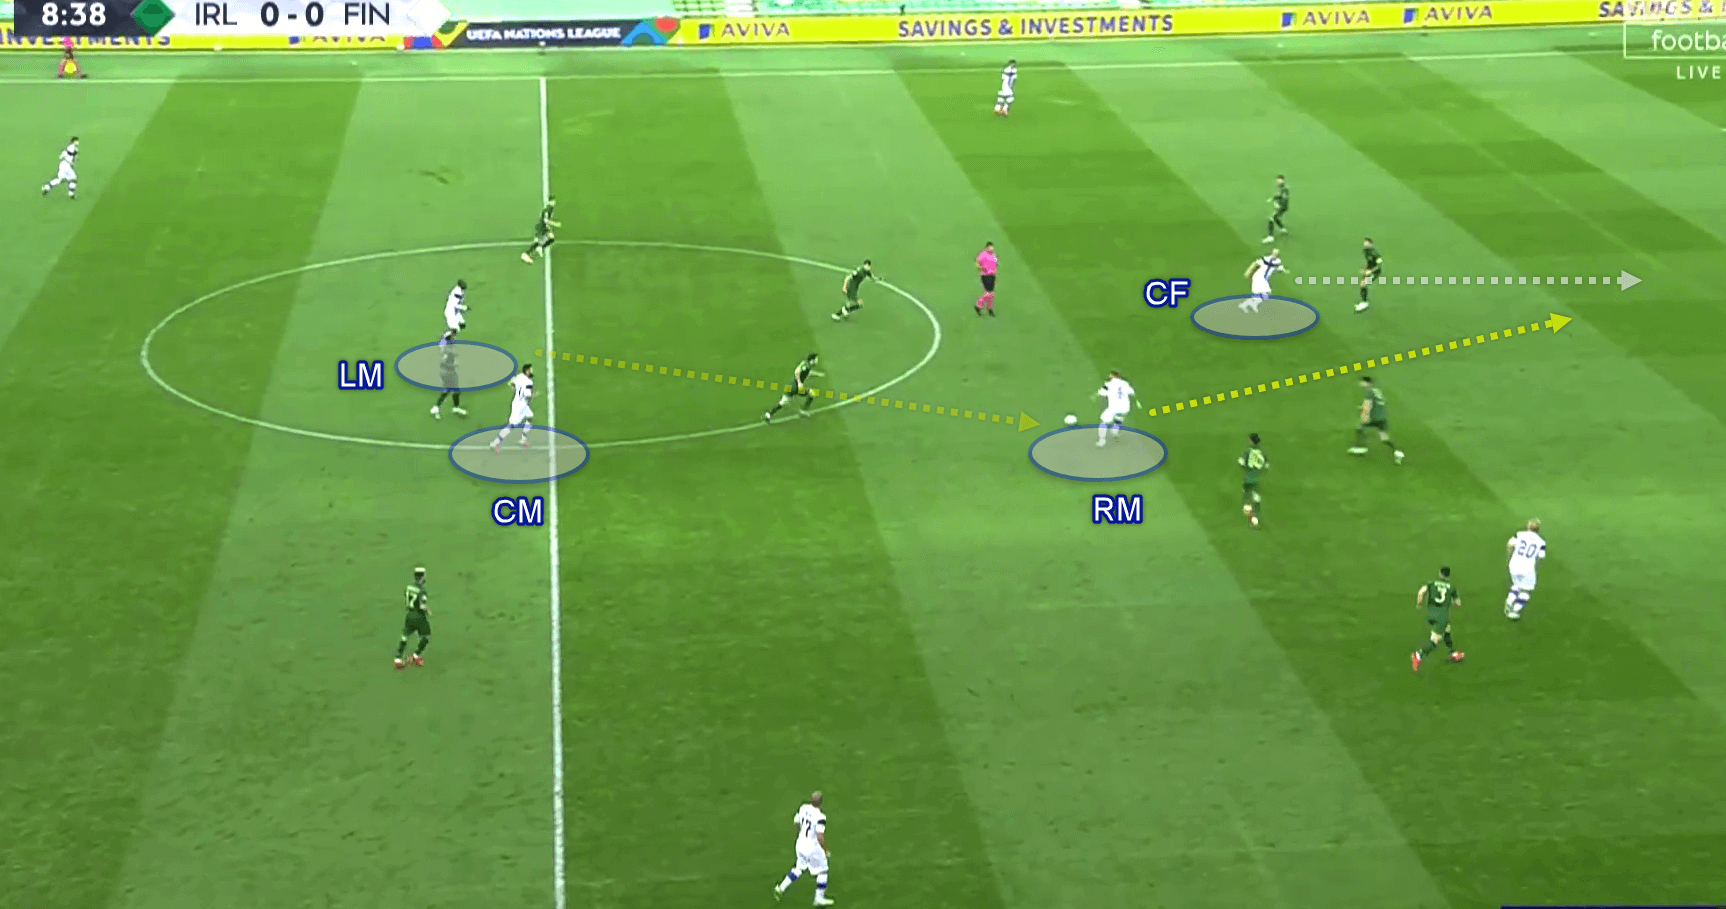 https://totalfootballanalysis.com/match-analysis/euro-2020-qulifiers-finland-vs-italy-tactical-analysis-tactics